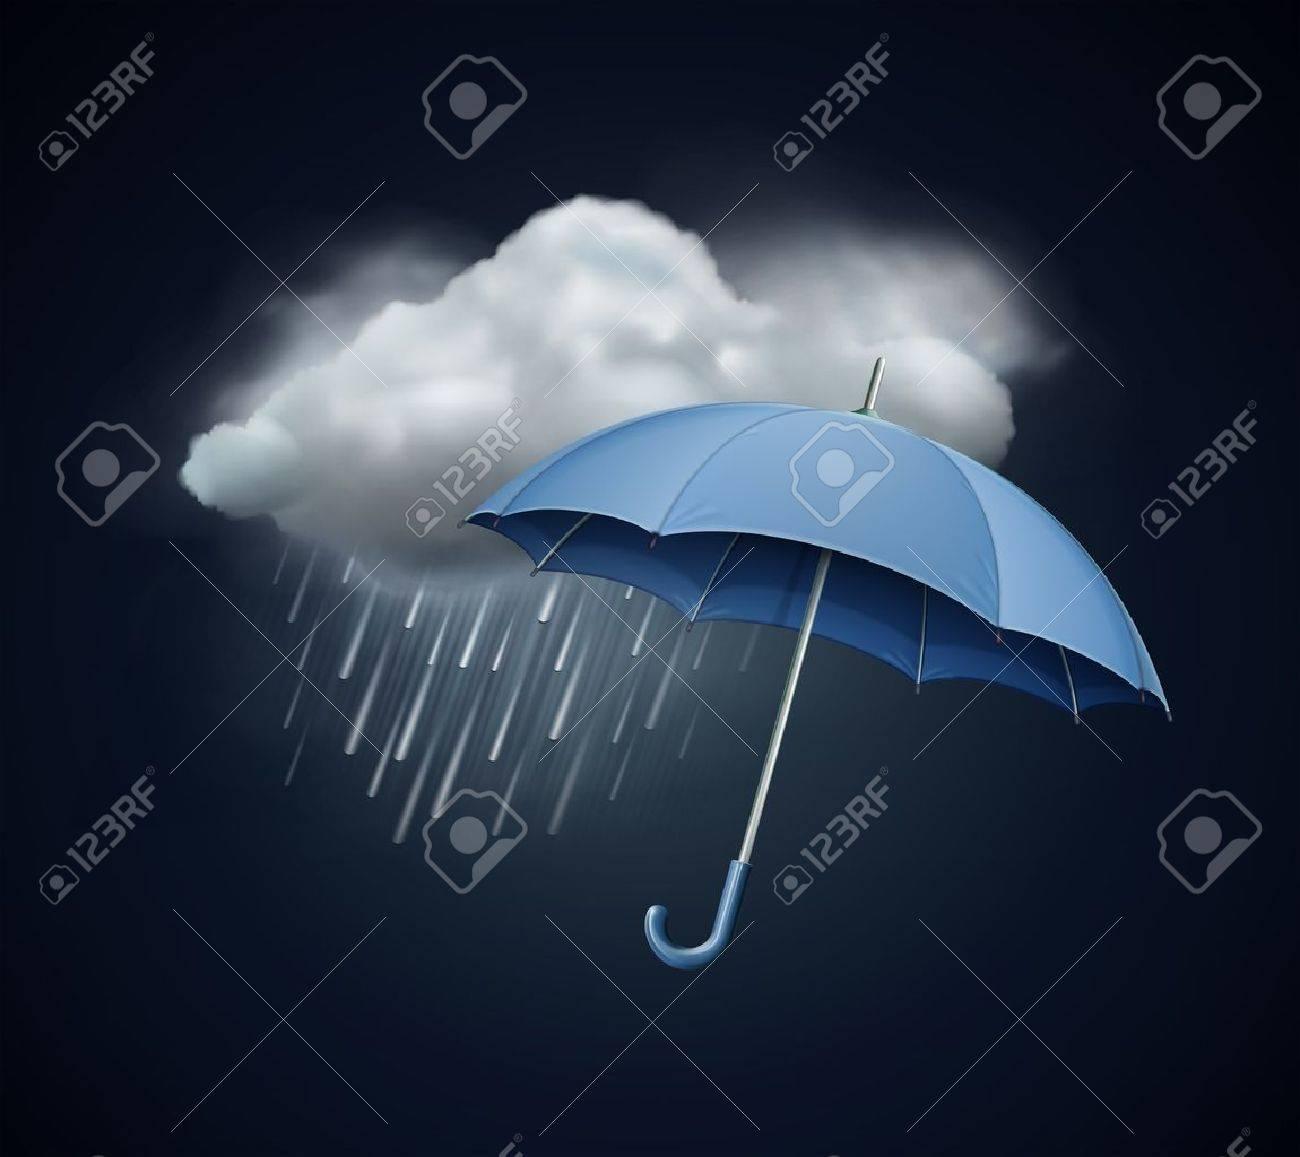 Rain Falling Umbrella